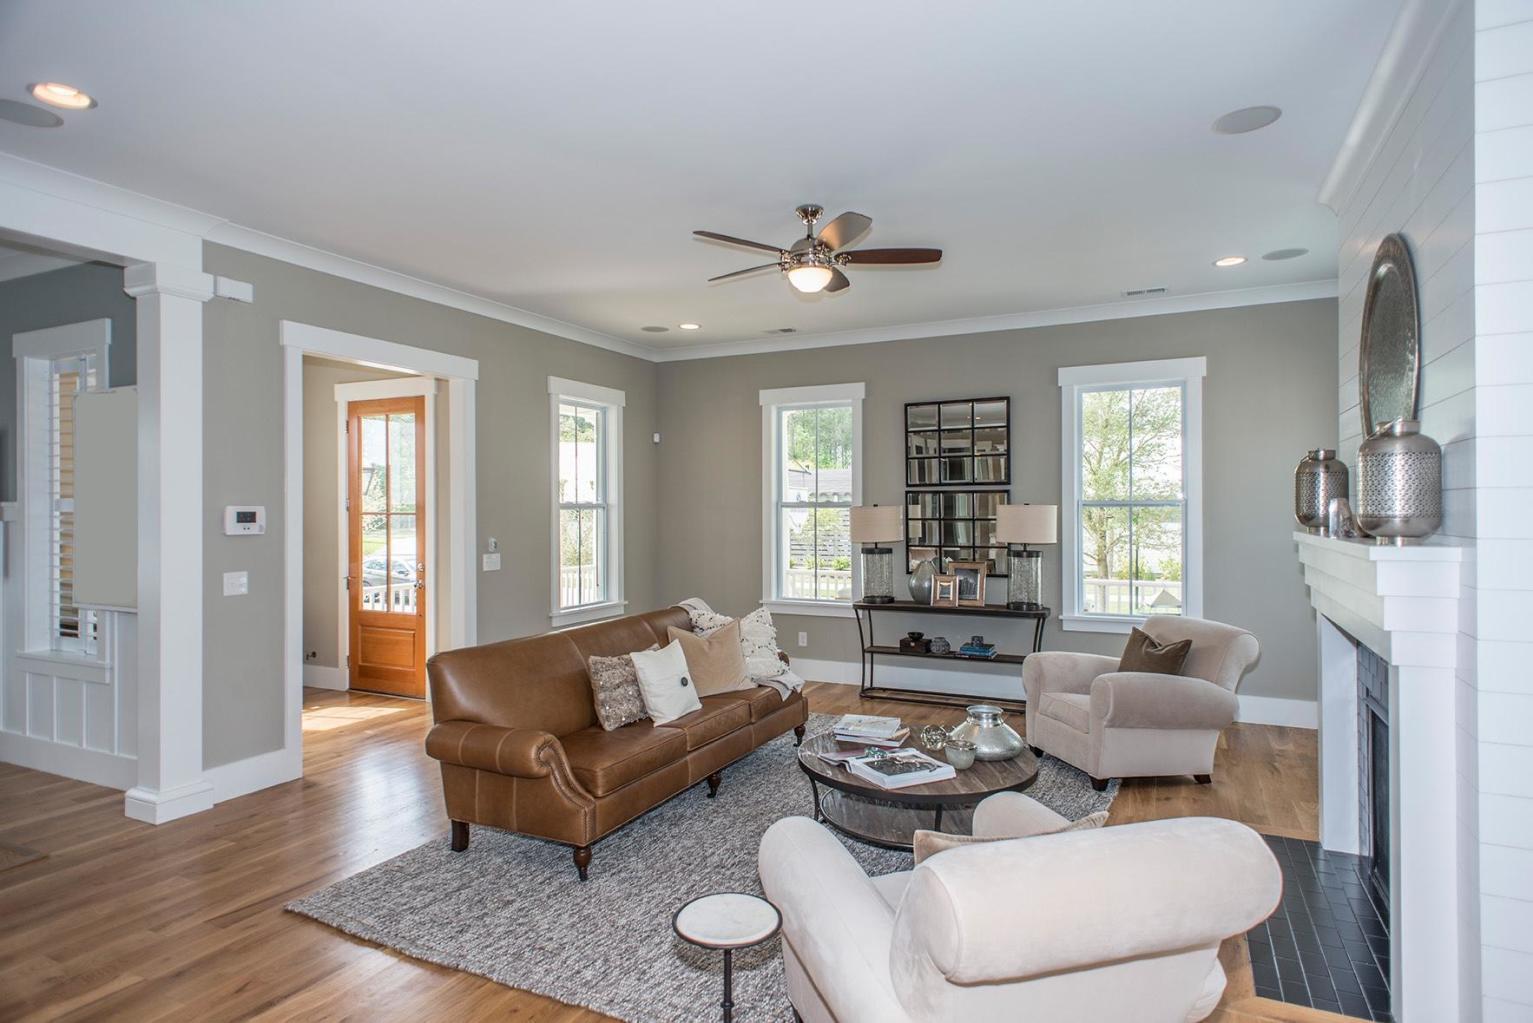 Carolina Park Homes For Sale - 1534 Banning, Mount Pleasant, SC - 20